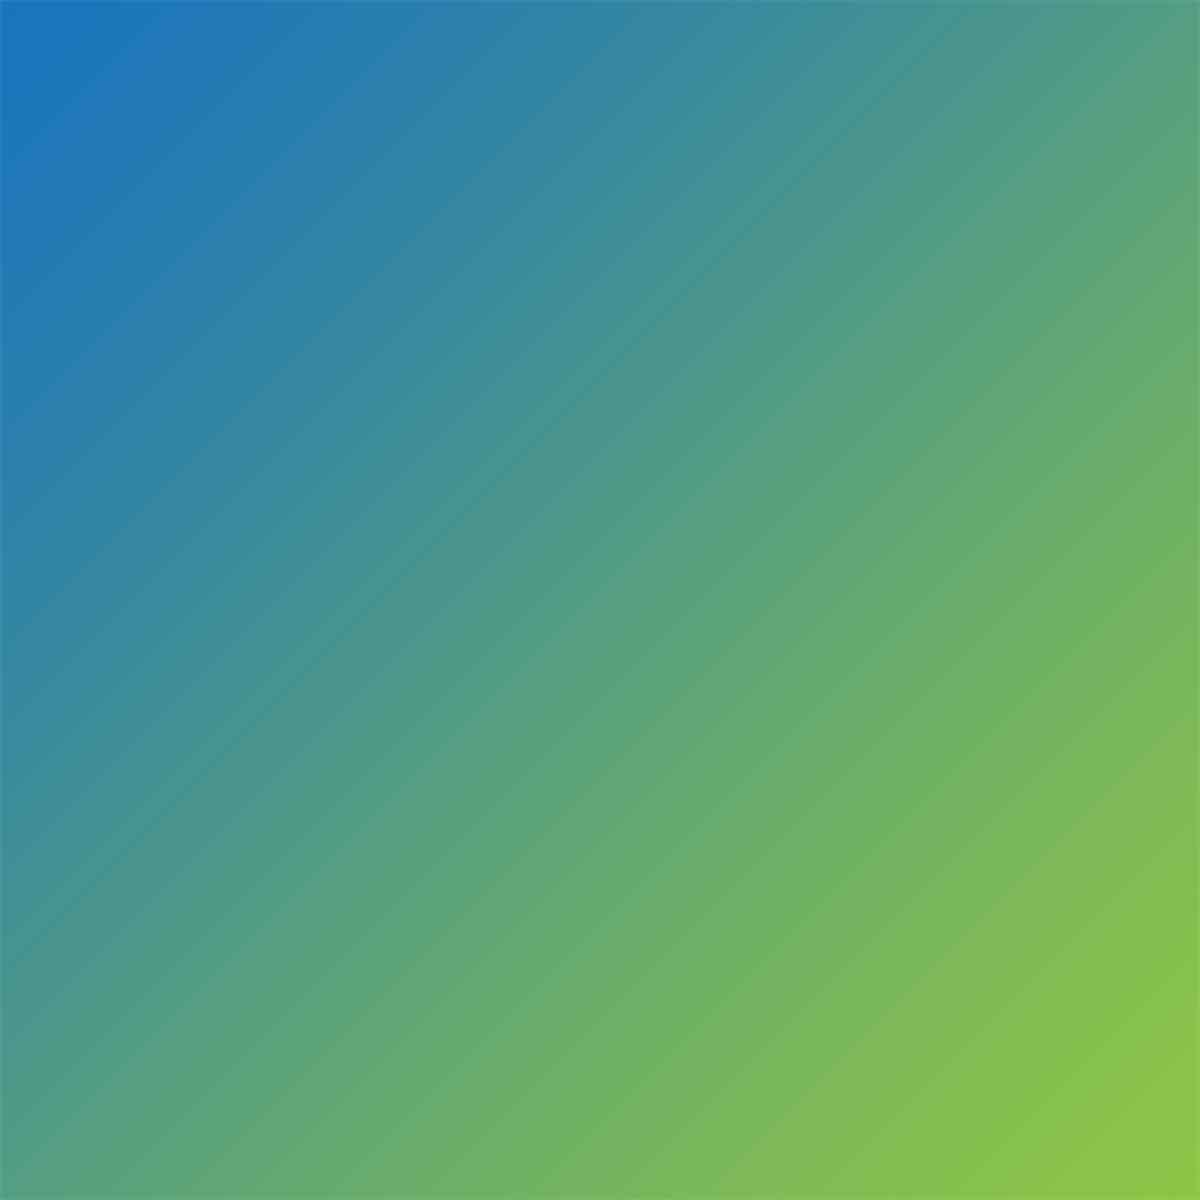 https://www.doryanart.com/wp-content/uploads/2018/09/bgn-image-box-gradient.jpg